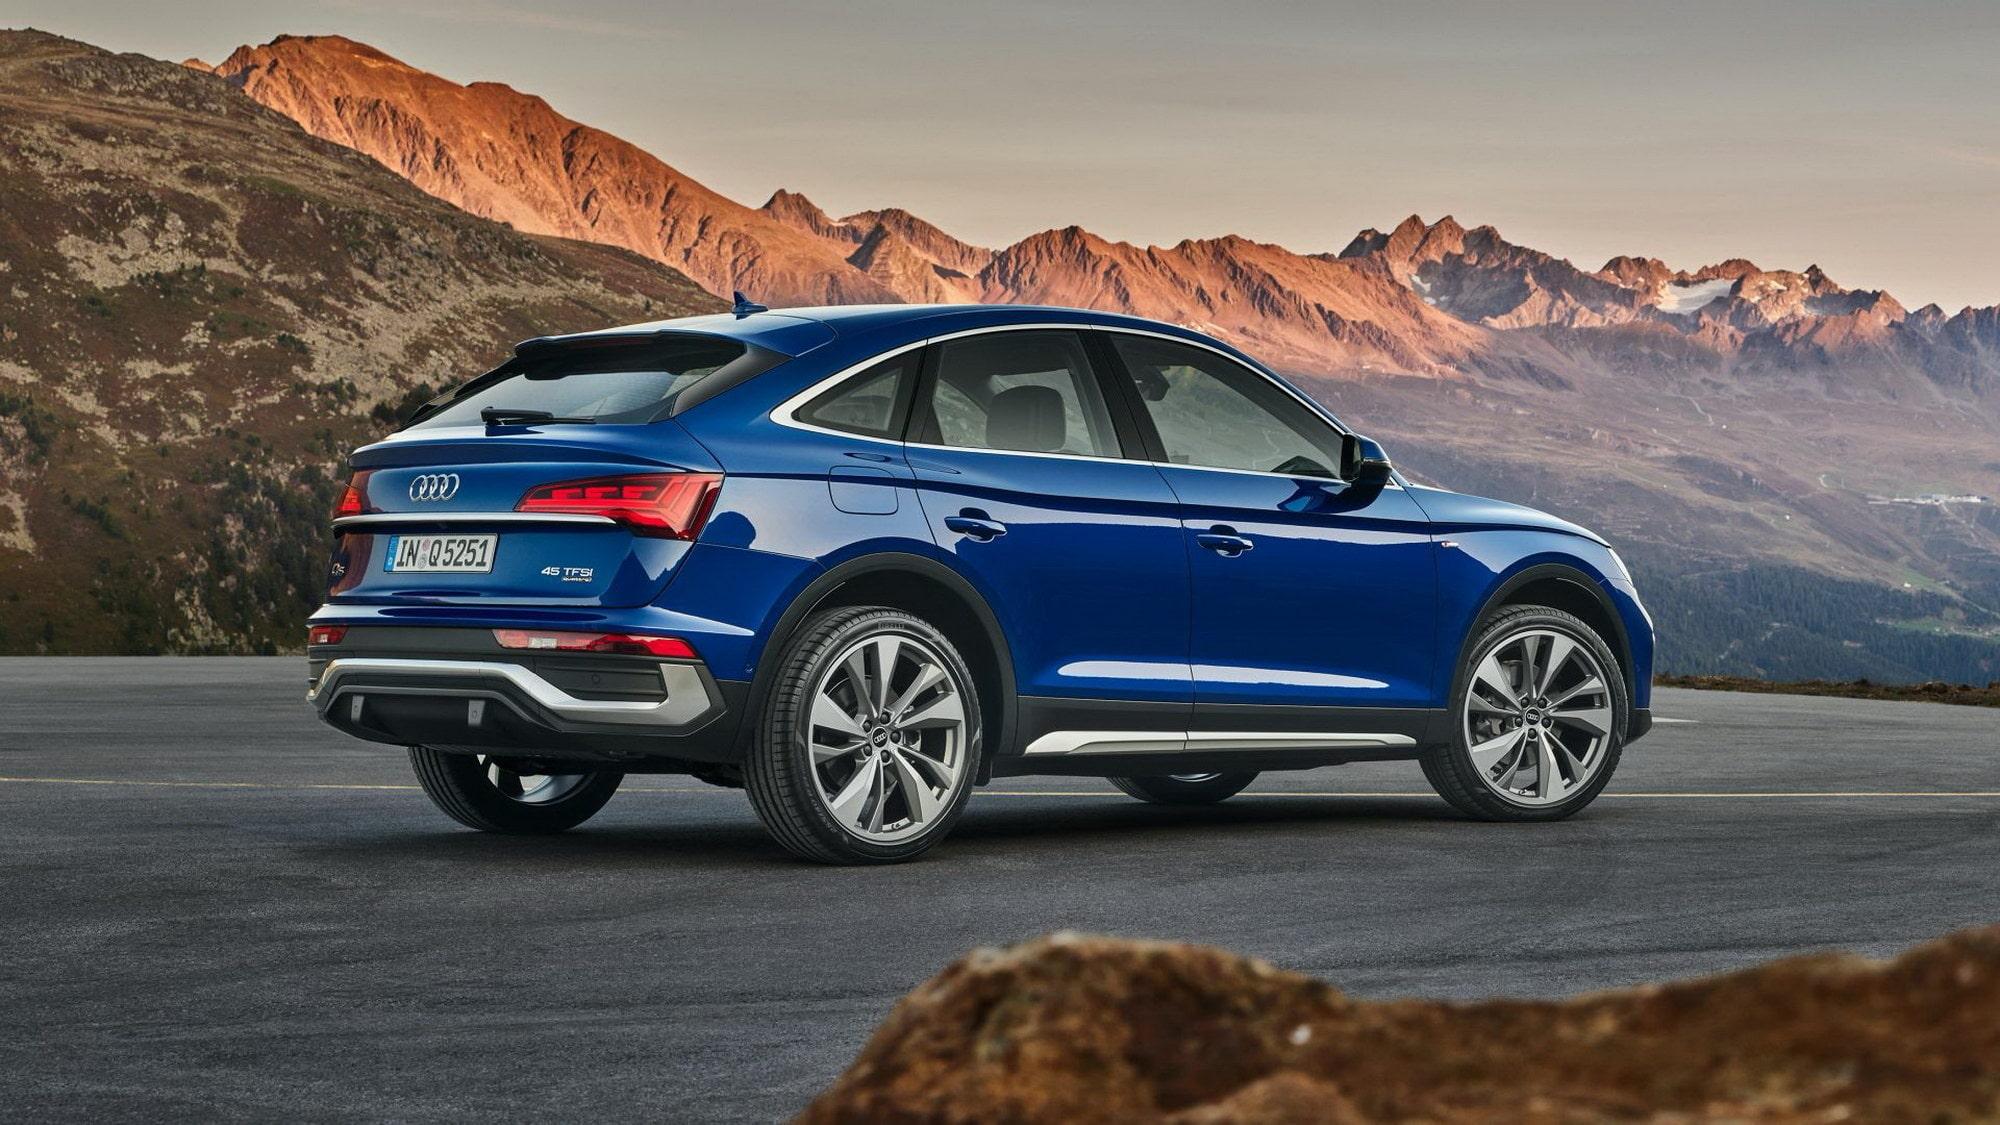 Audi Q5 Sportback presenterad med slank profil   Teknikens ...